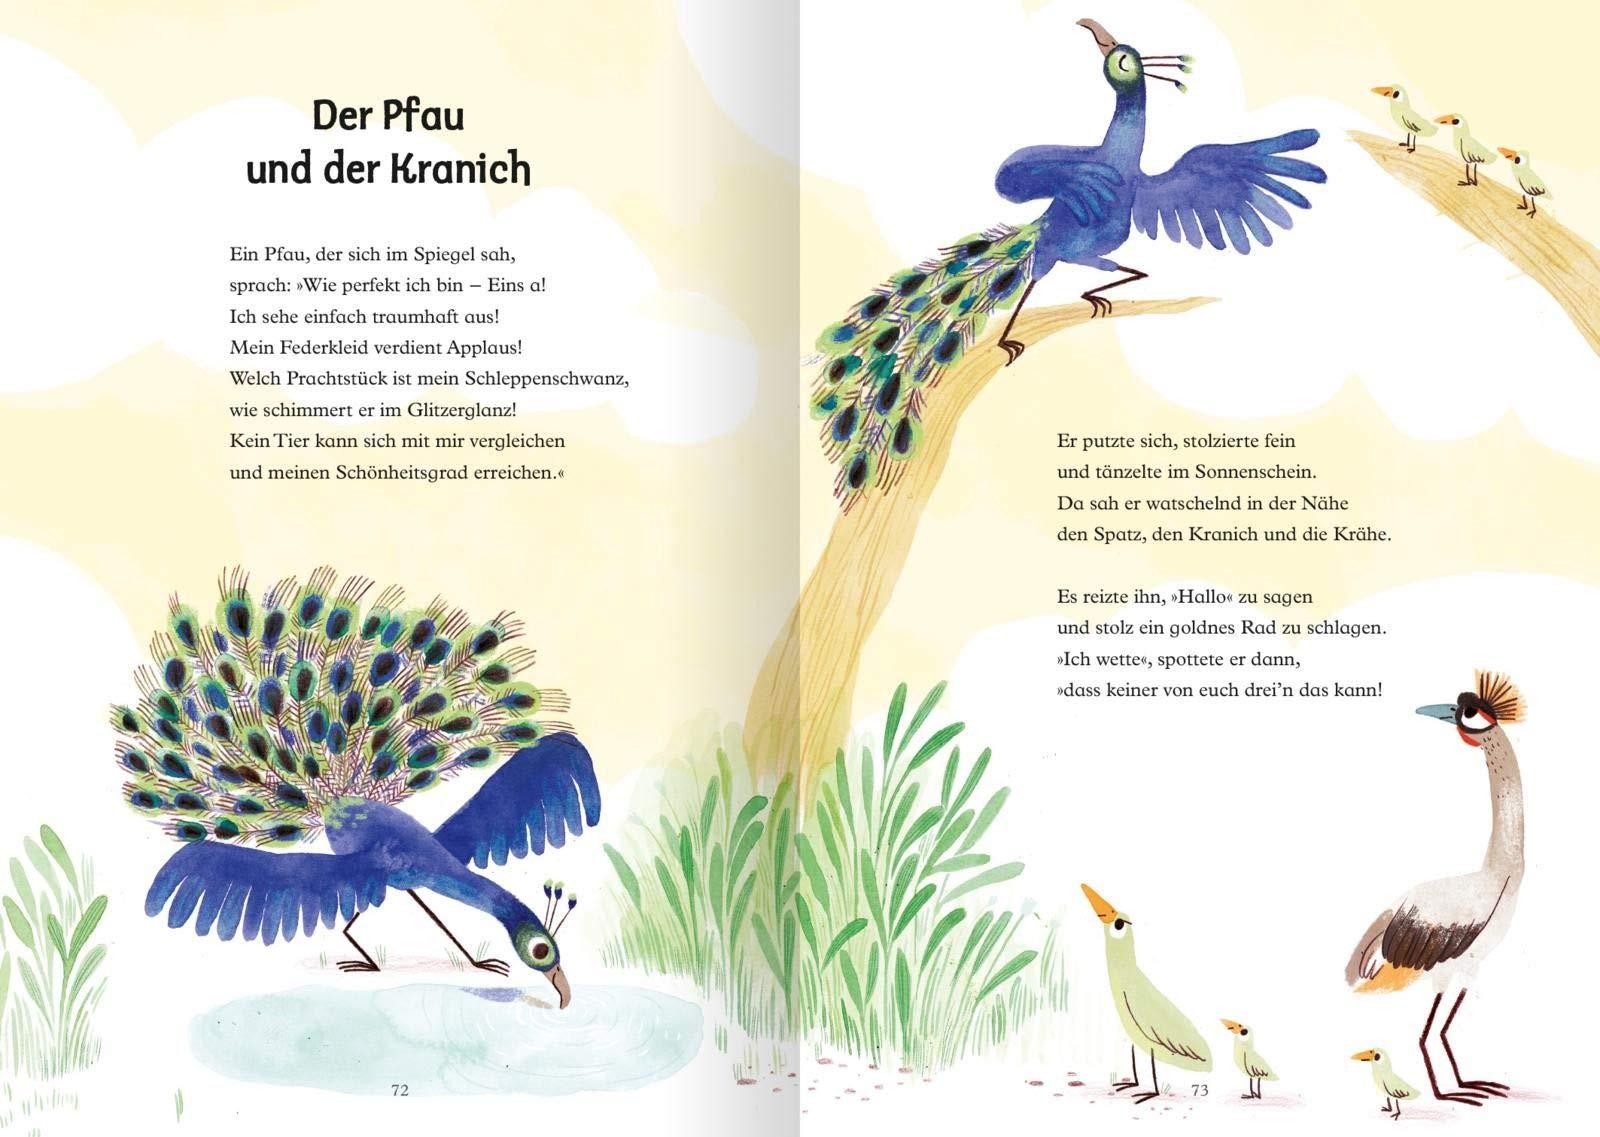 Asops Tierfabeln Amazon De Asop Woollard Elli Altes Marta Boese Cornelia Bucher